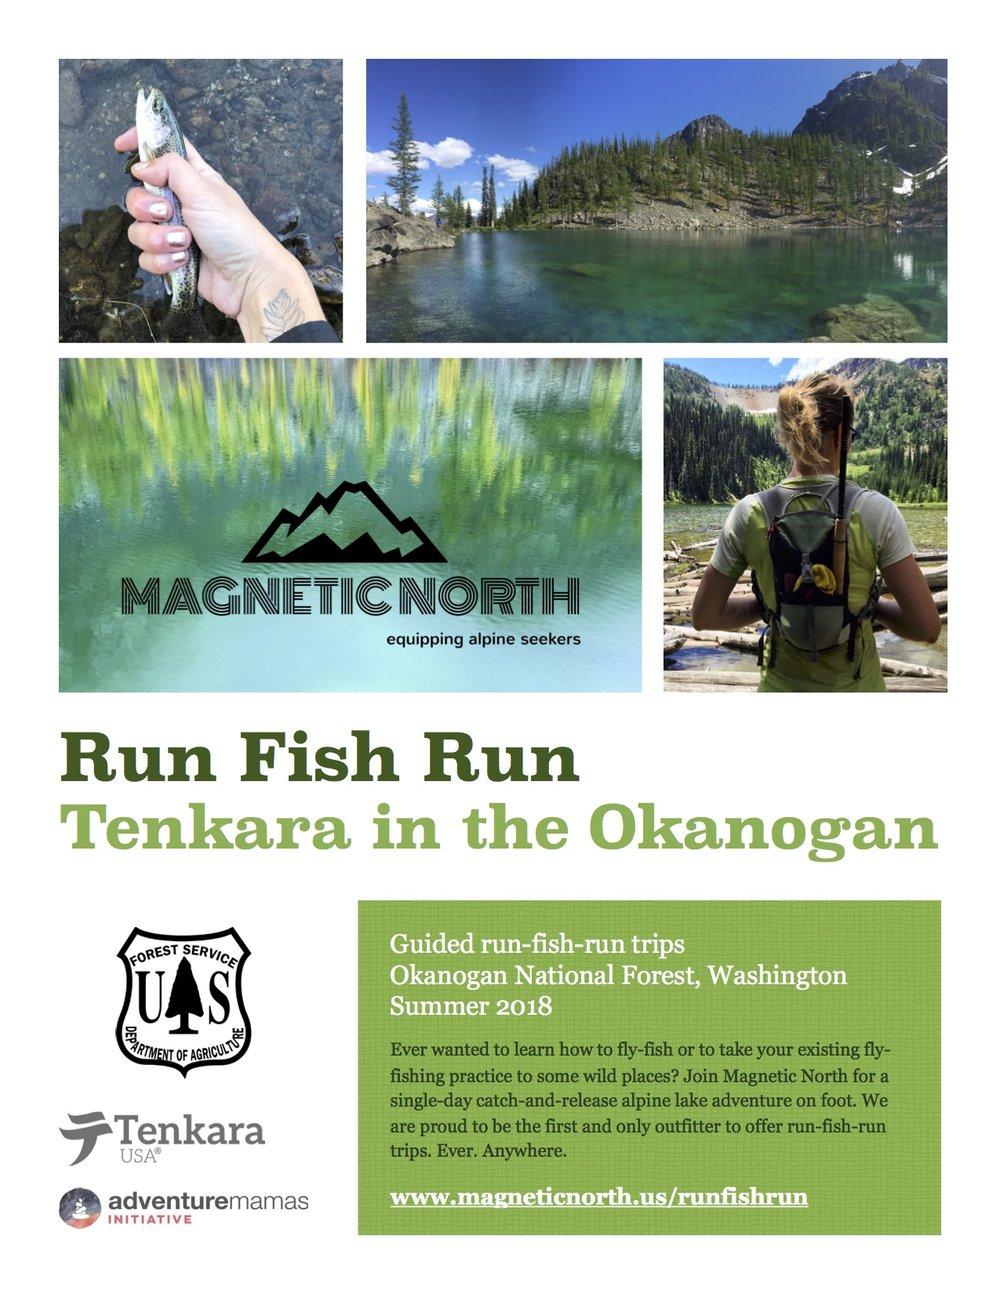 Run fish run flier.jpg